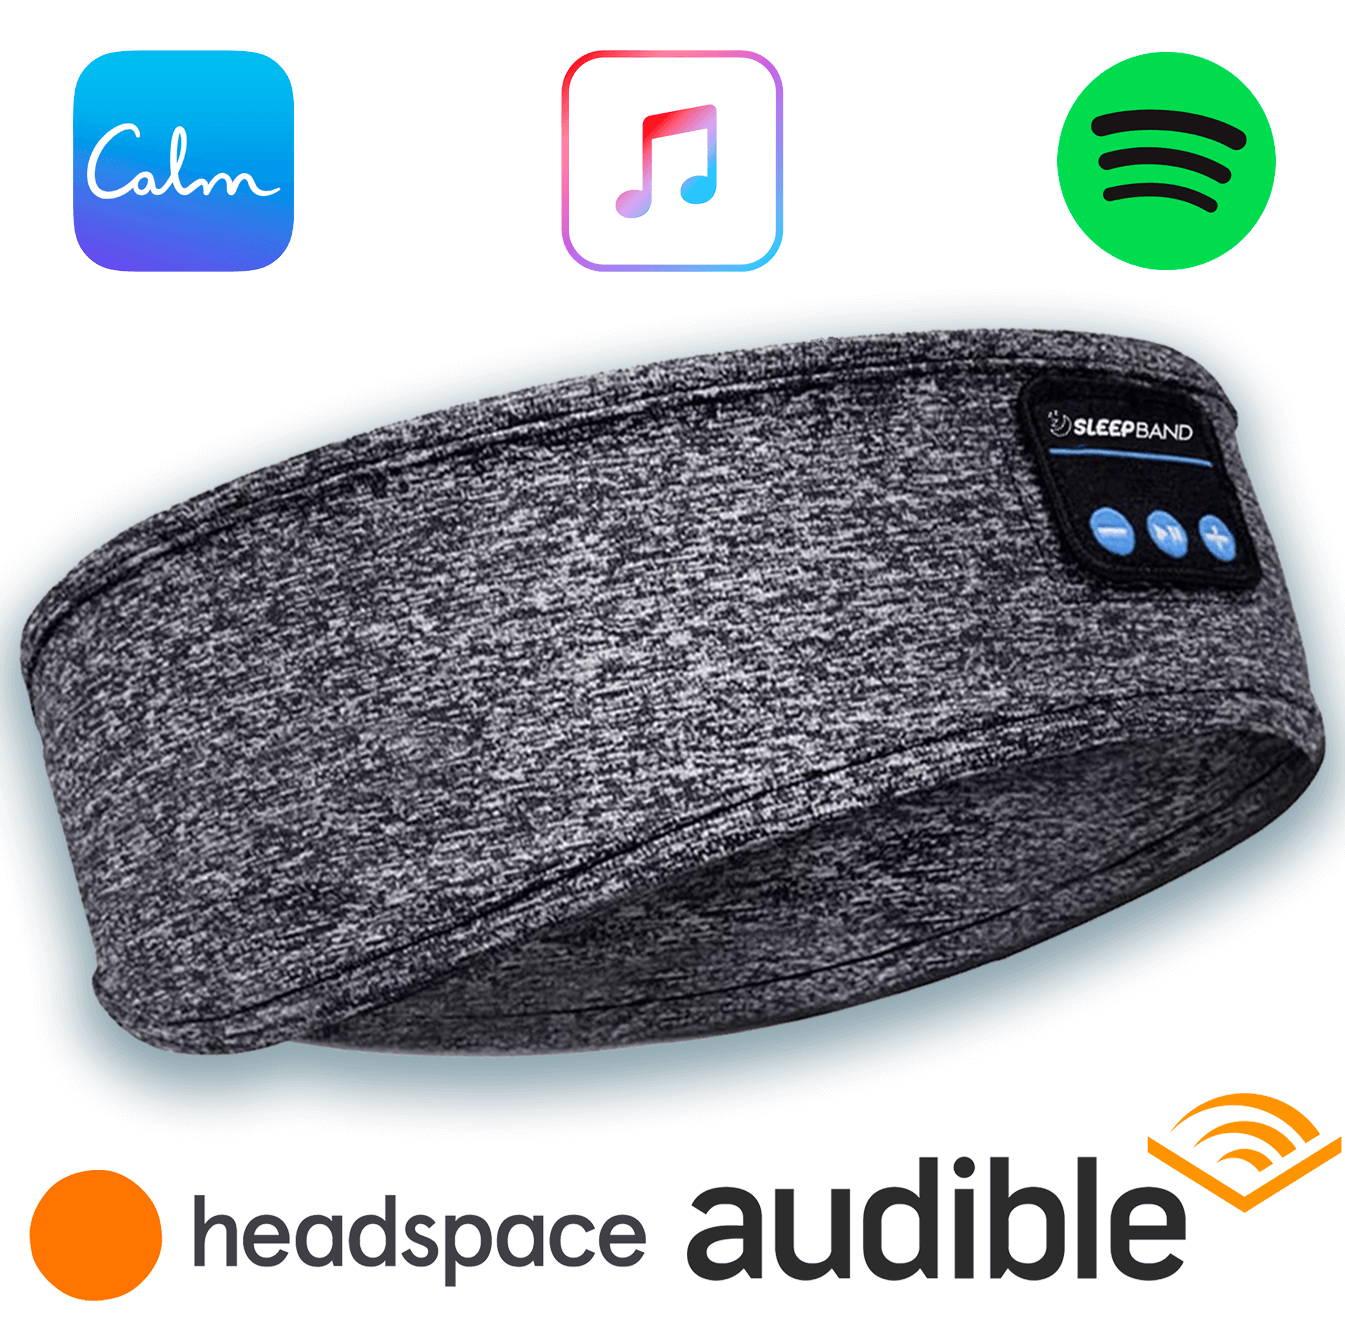 Meditation headphones, ASMR Headphones, Sleeping Headphones